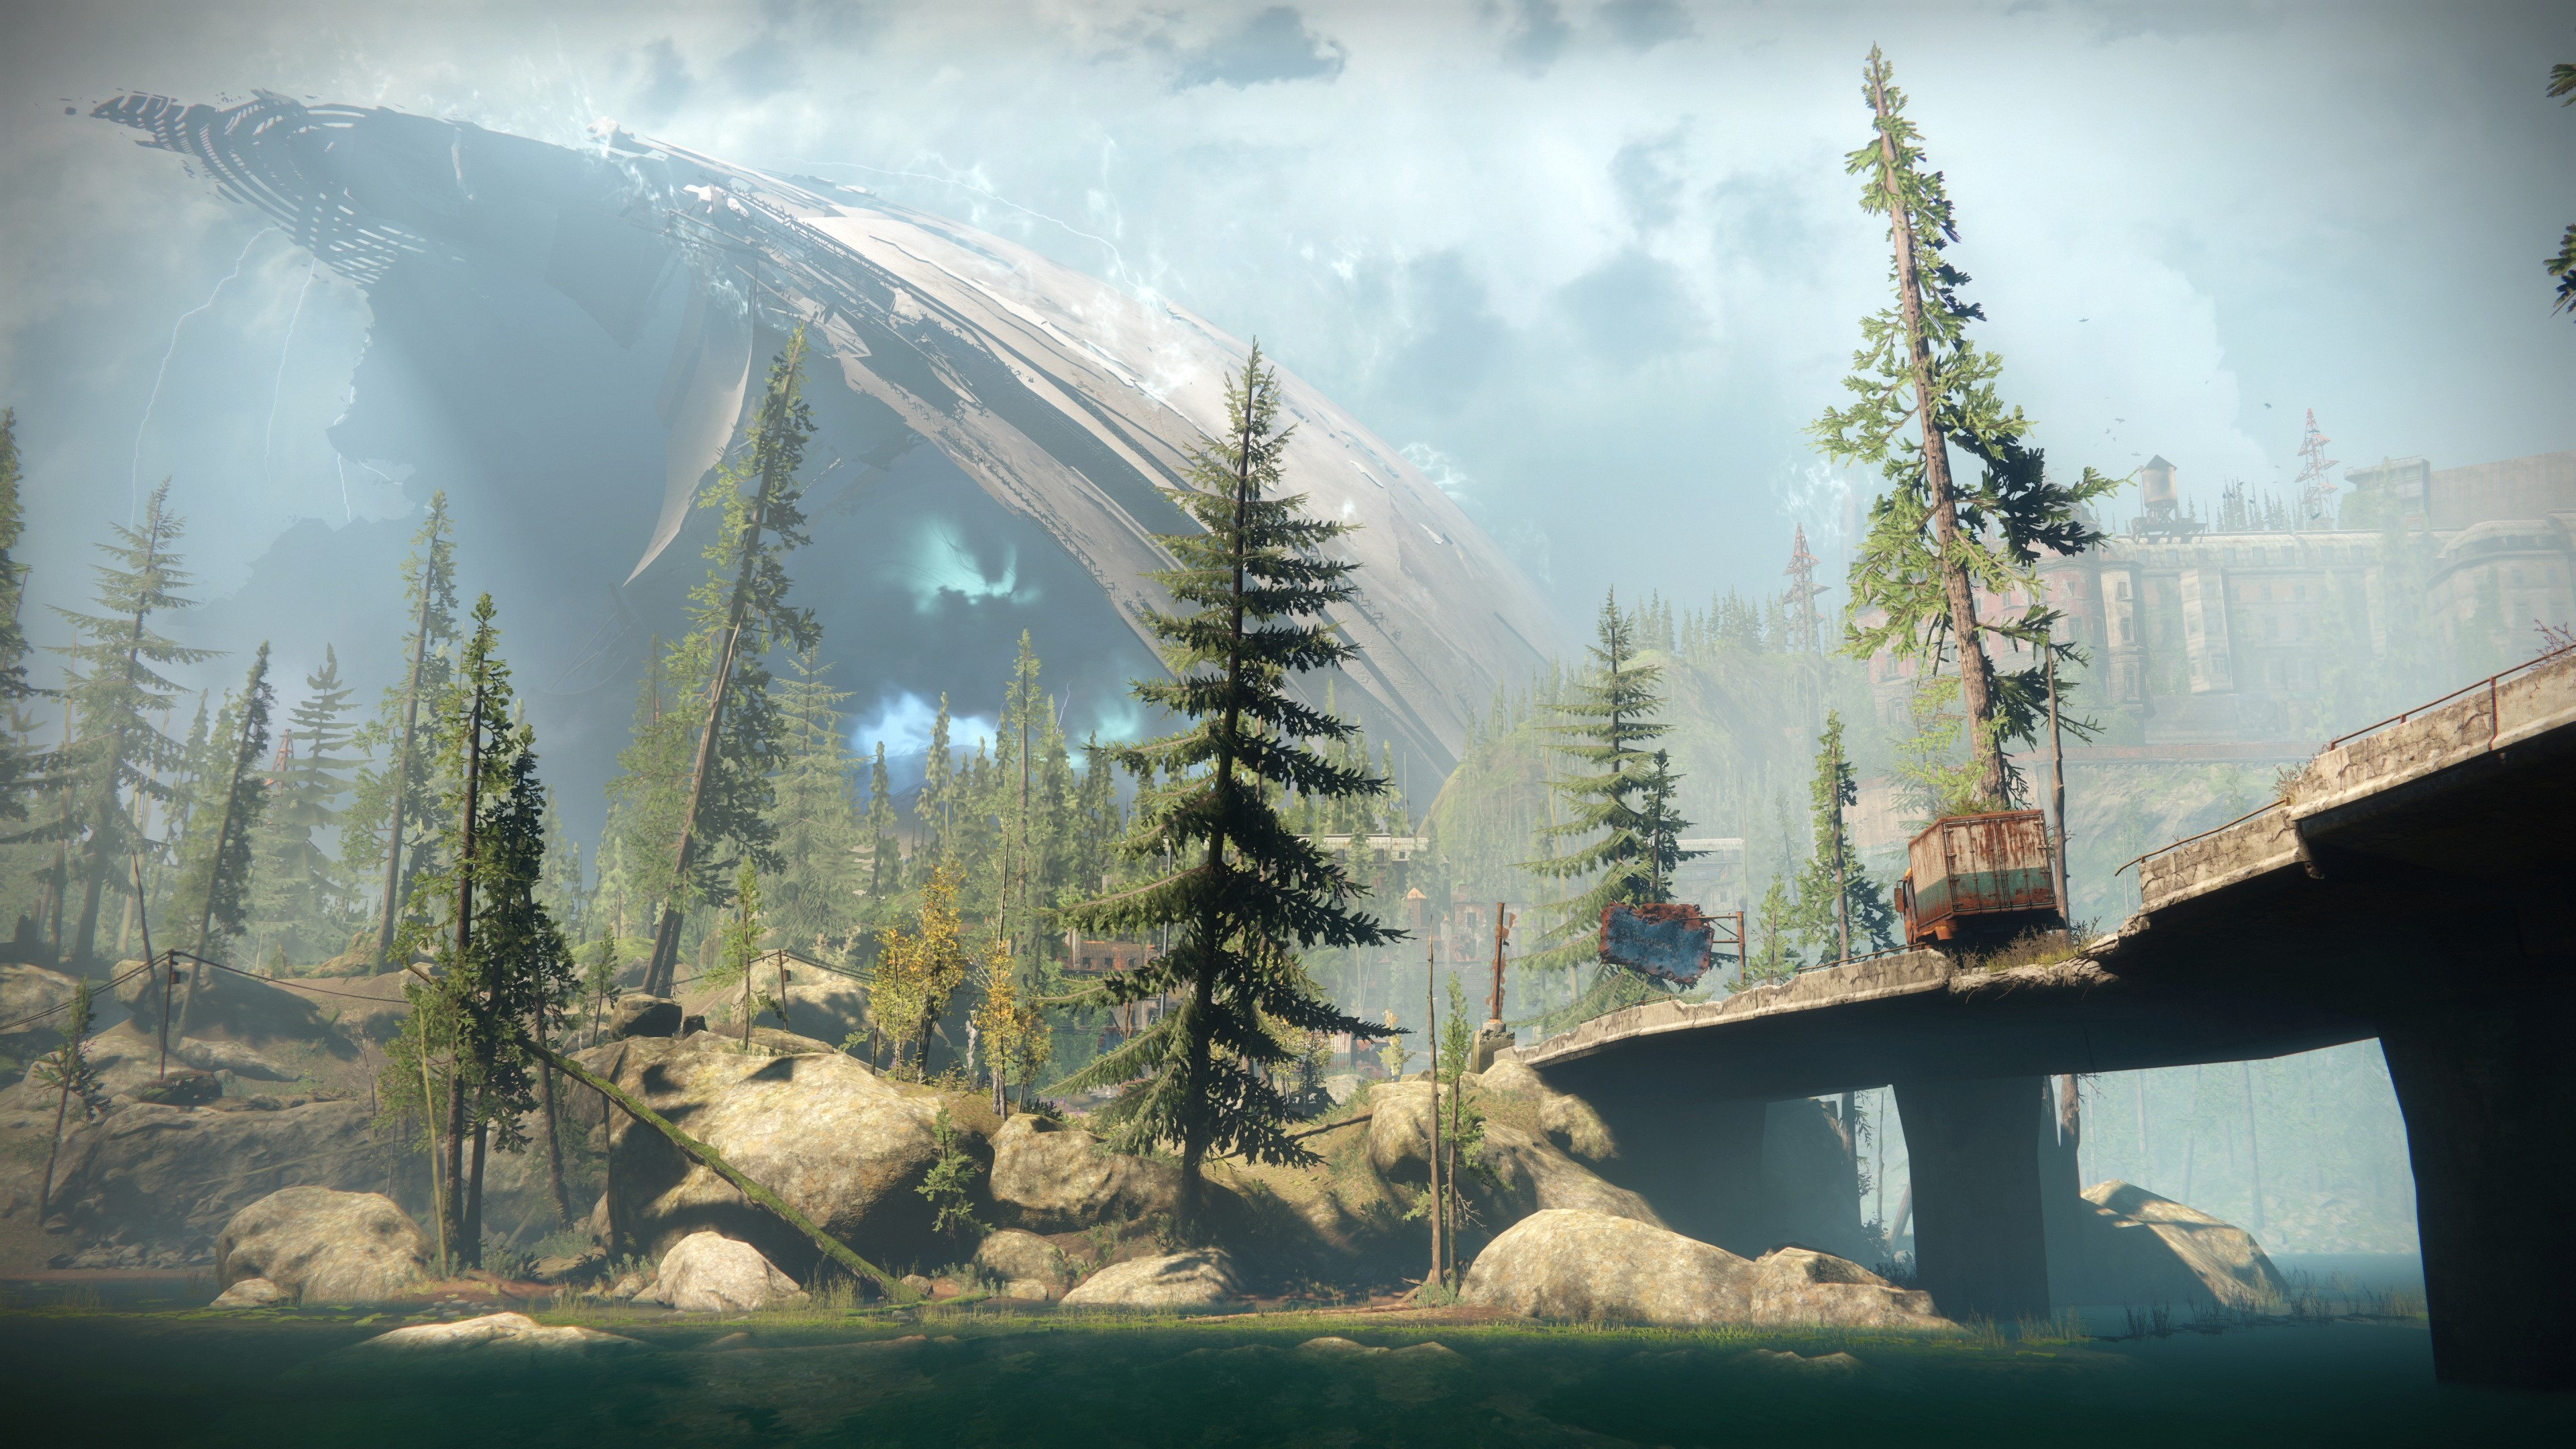 Wallpaper Destiny 2, 4k, screenshot, E3 2017, Games #13699